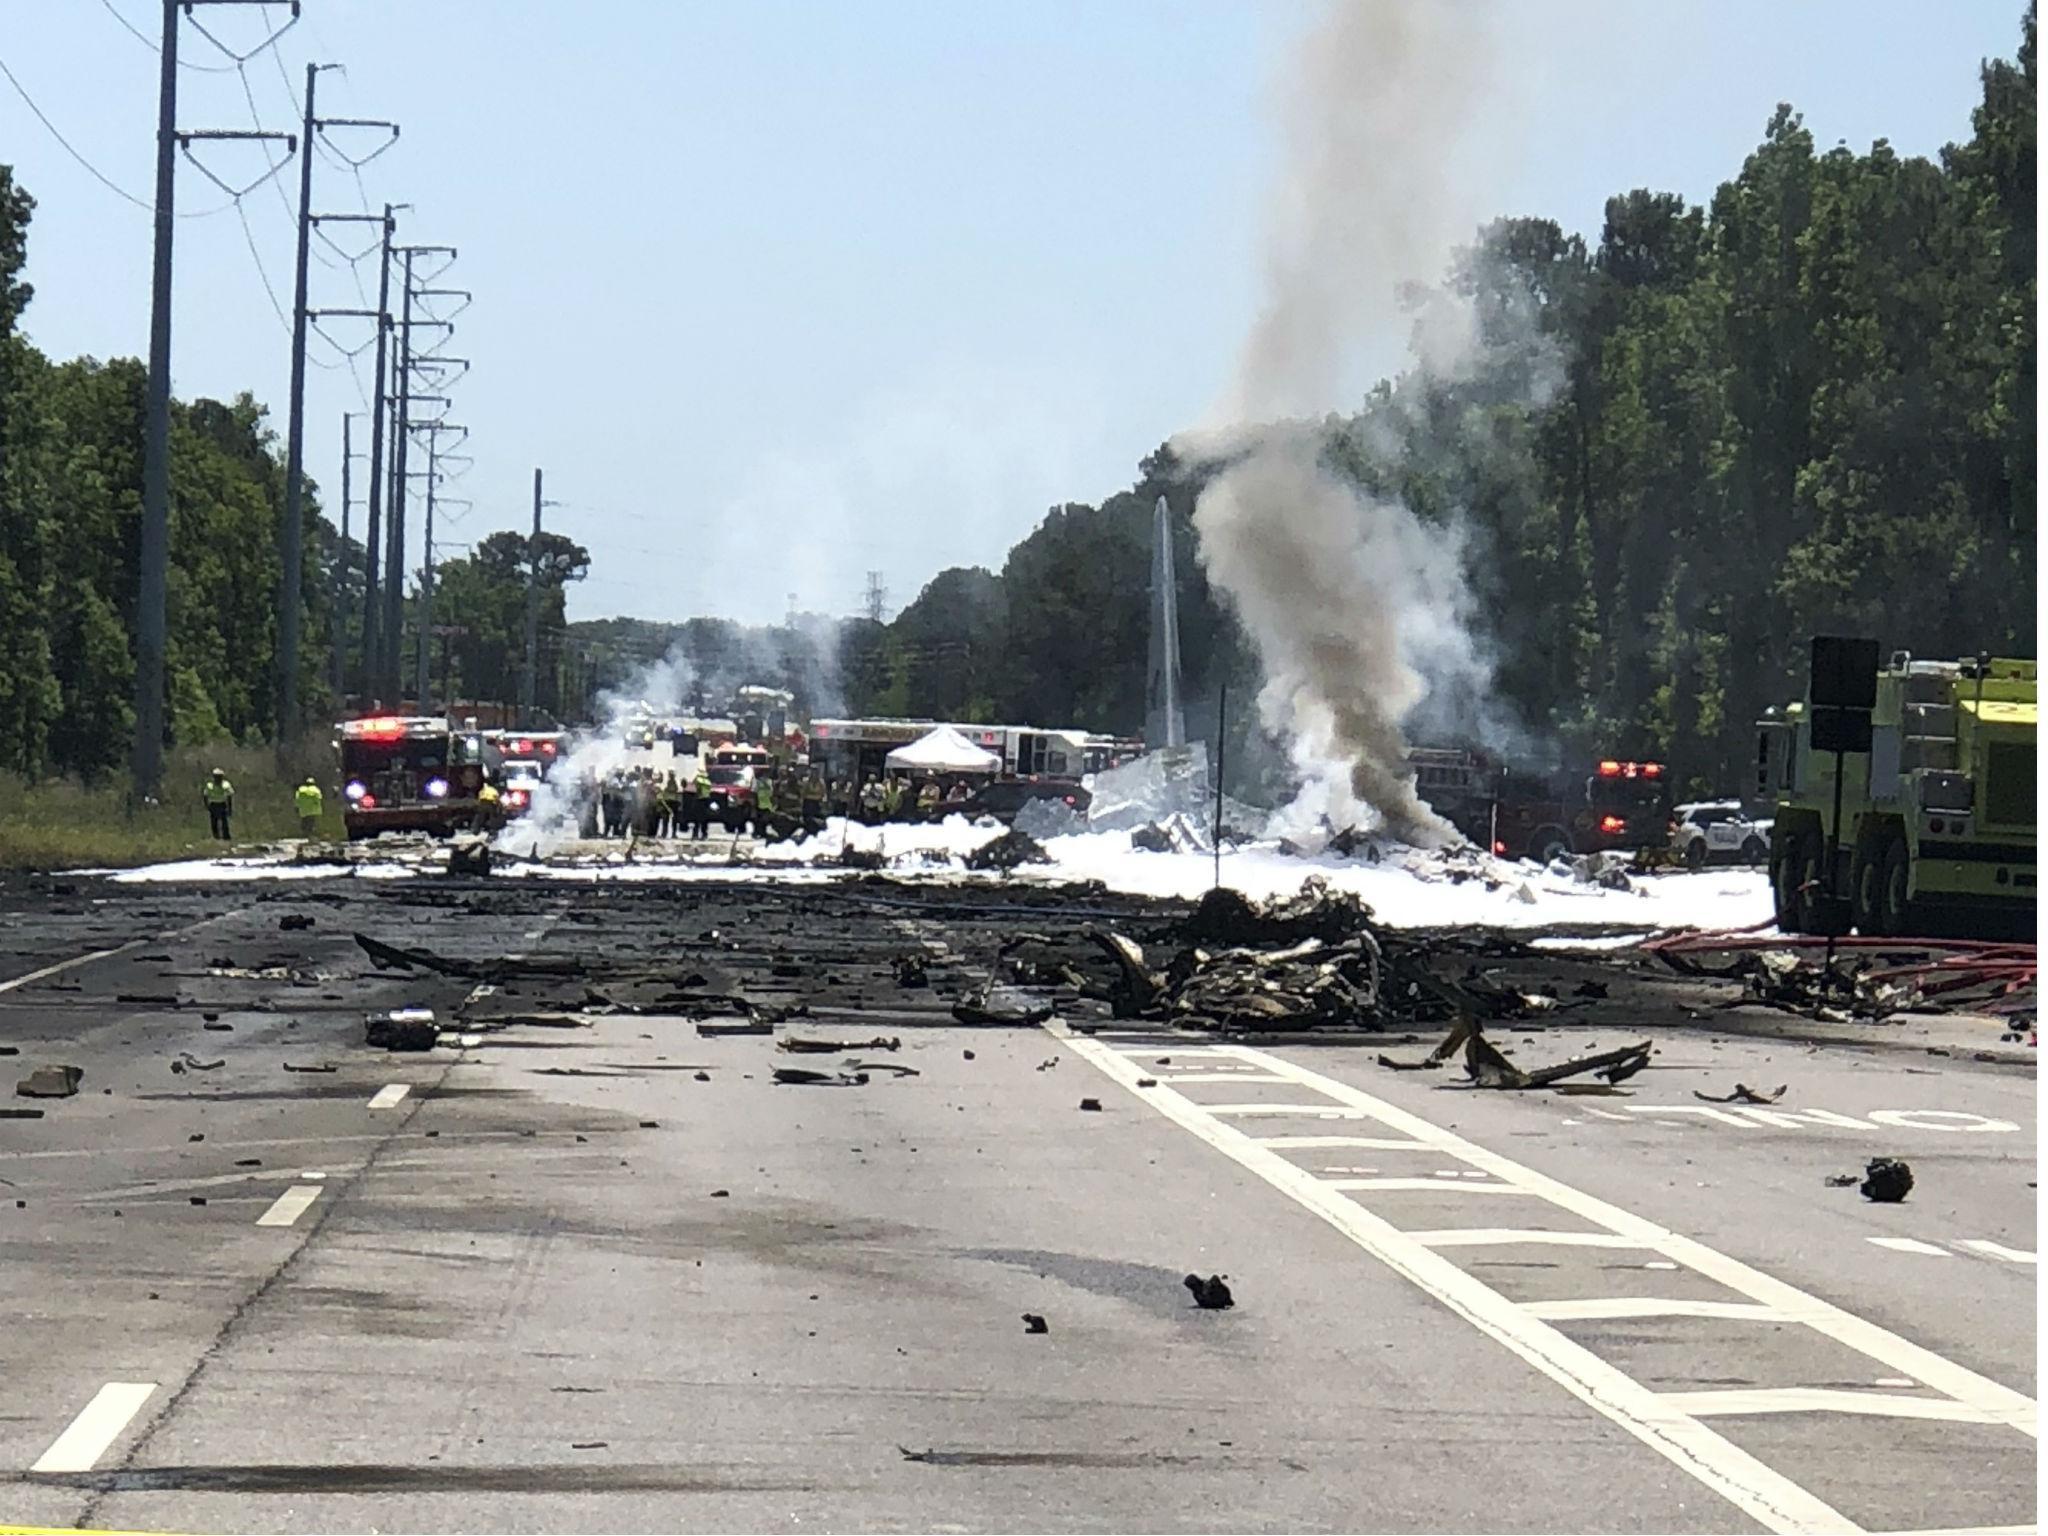 Hero' Savannah plane crash pilot 'tried to avoid pedestrians on